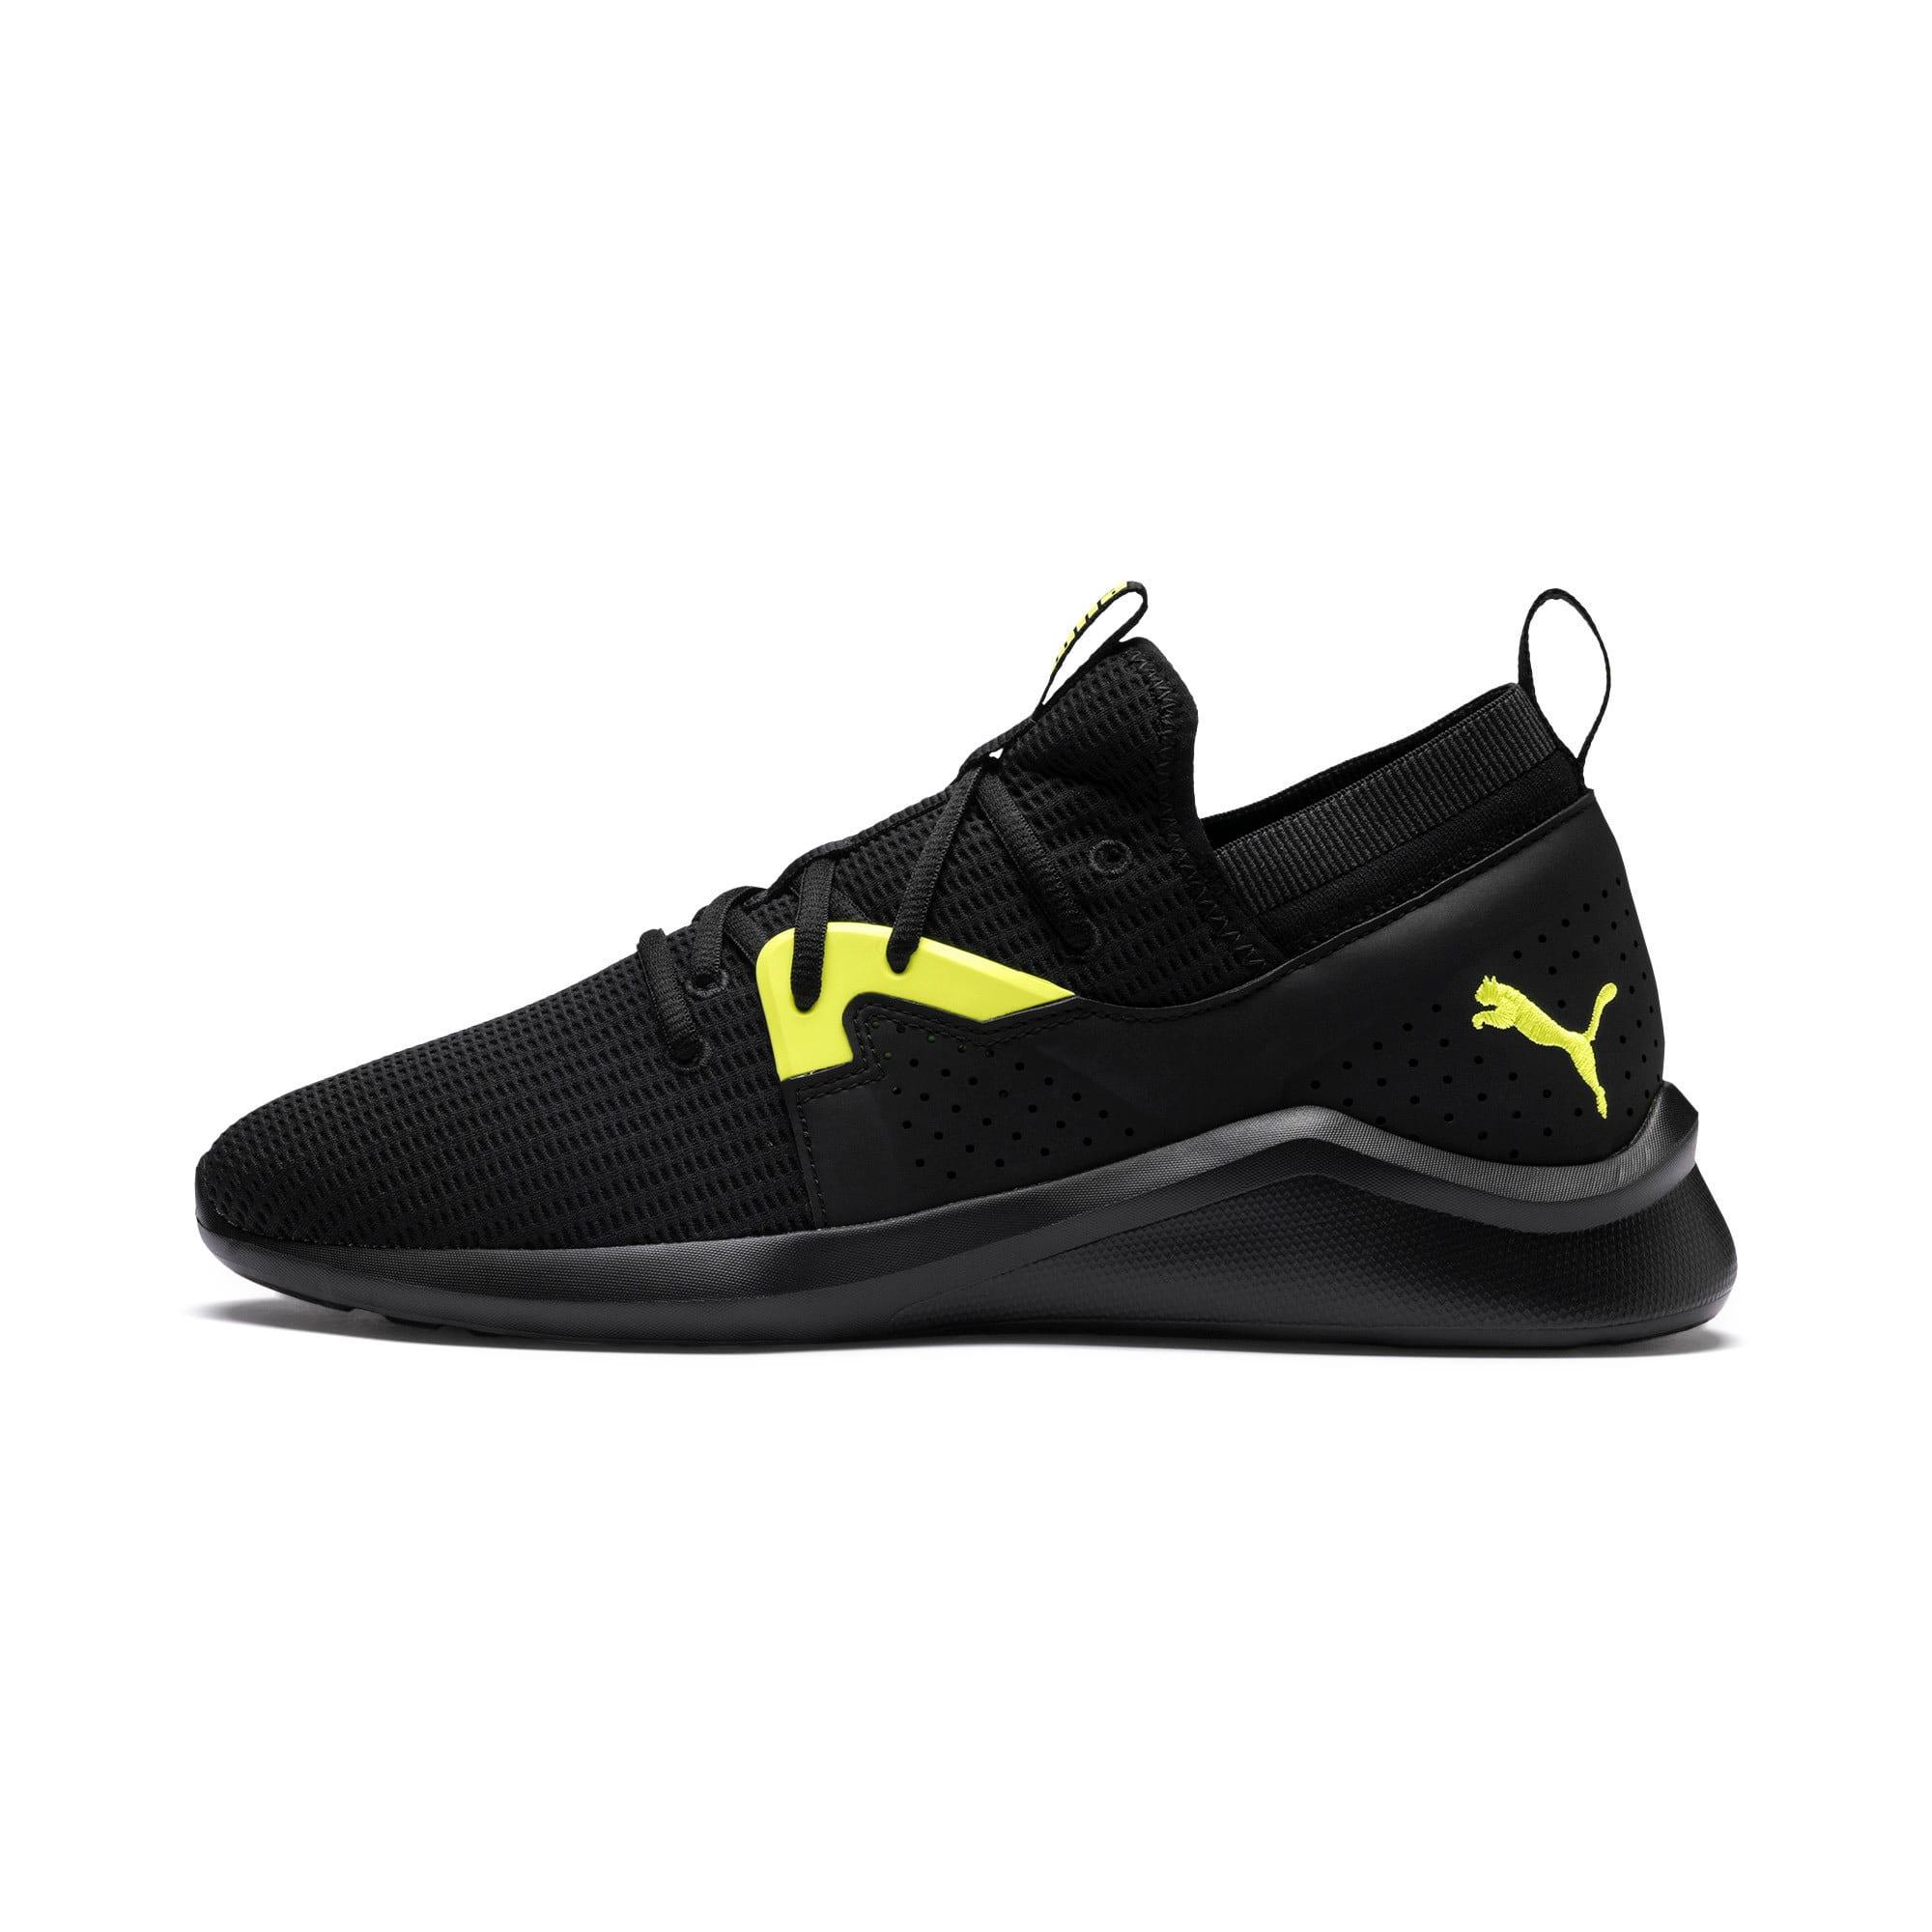 Thumbnail 1 of Emergence Future Men's Training Shoes, Black-Charcoal-Yellow, medium